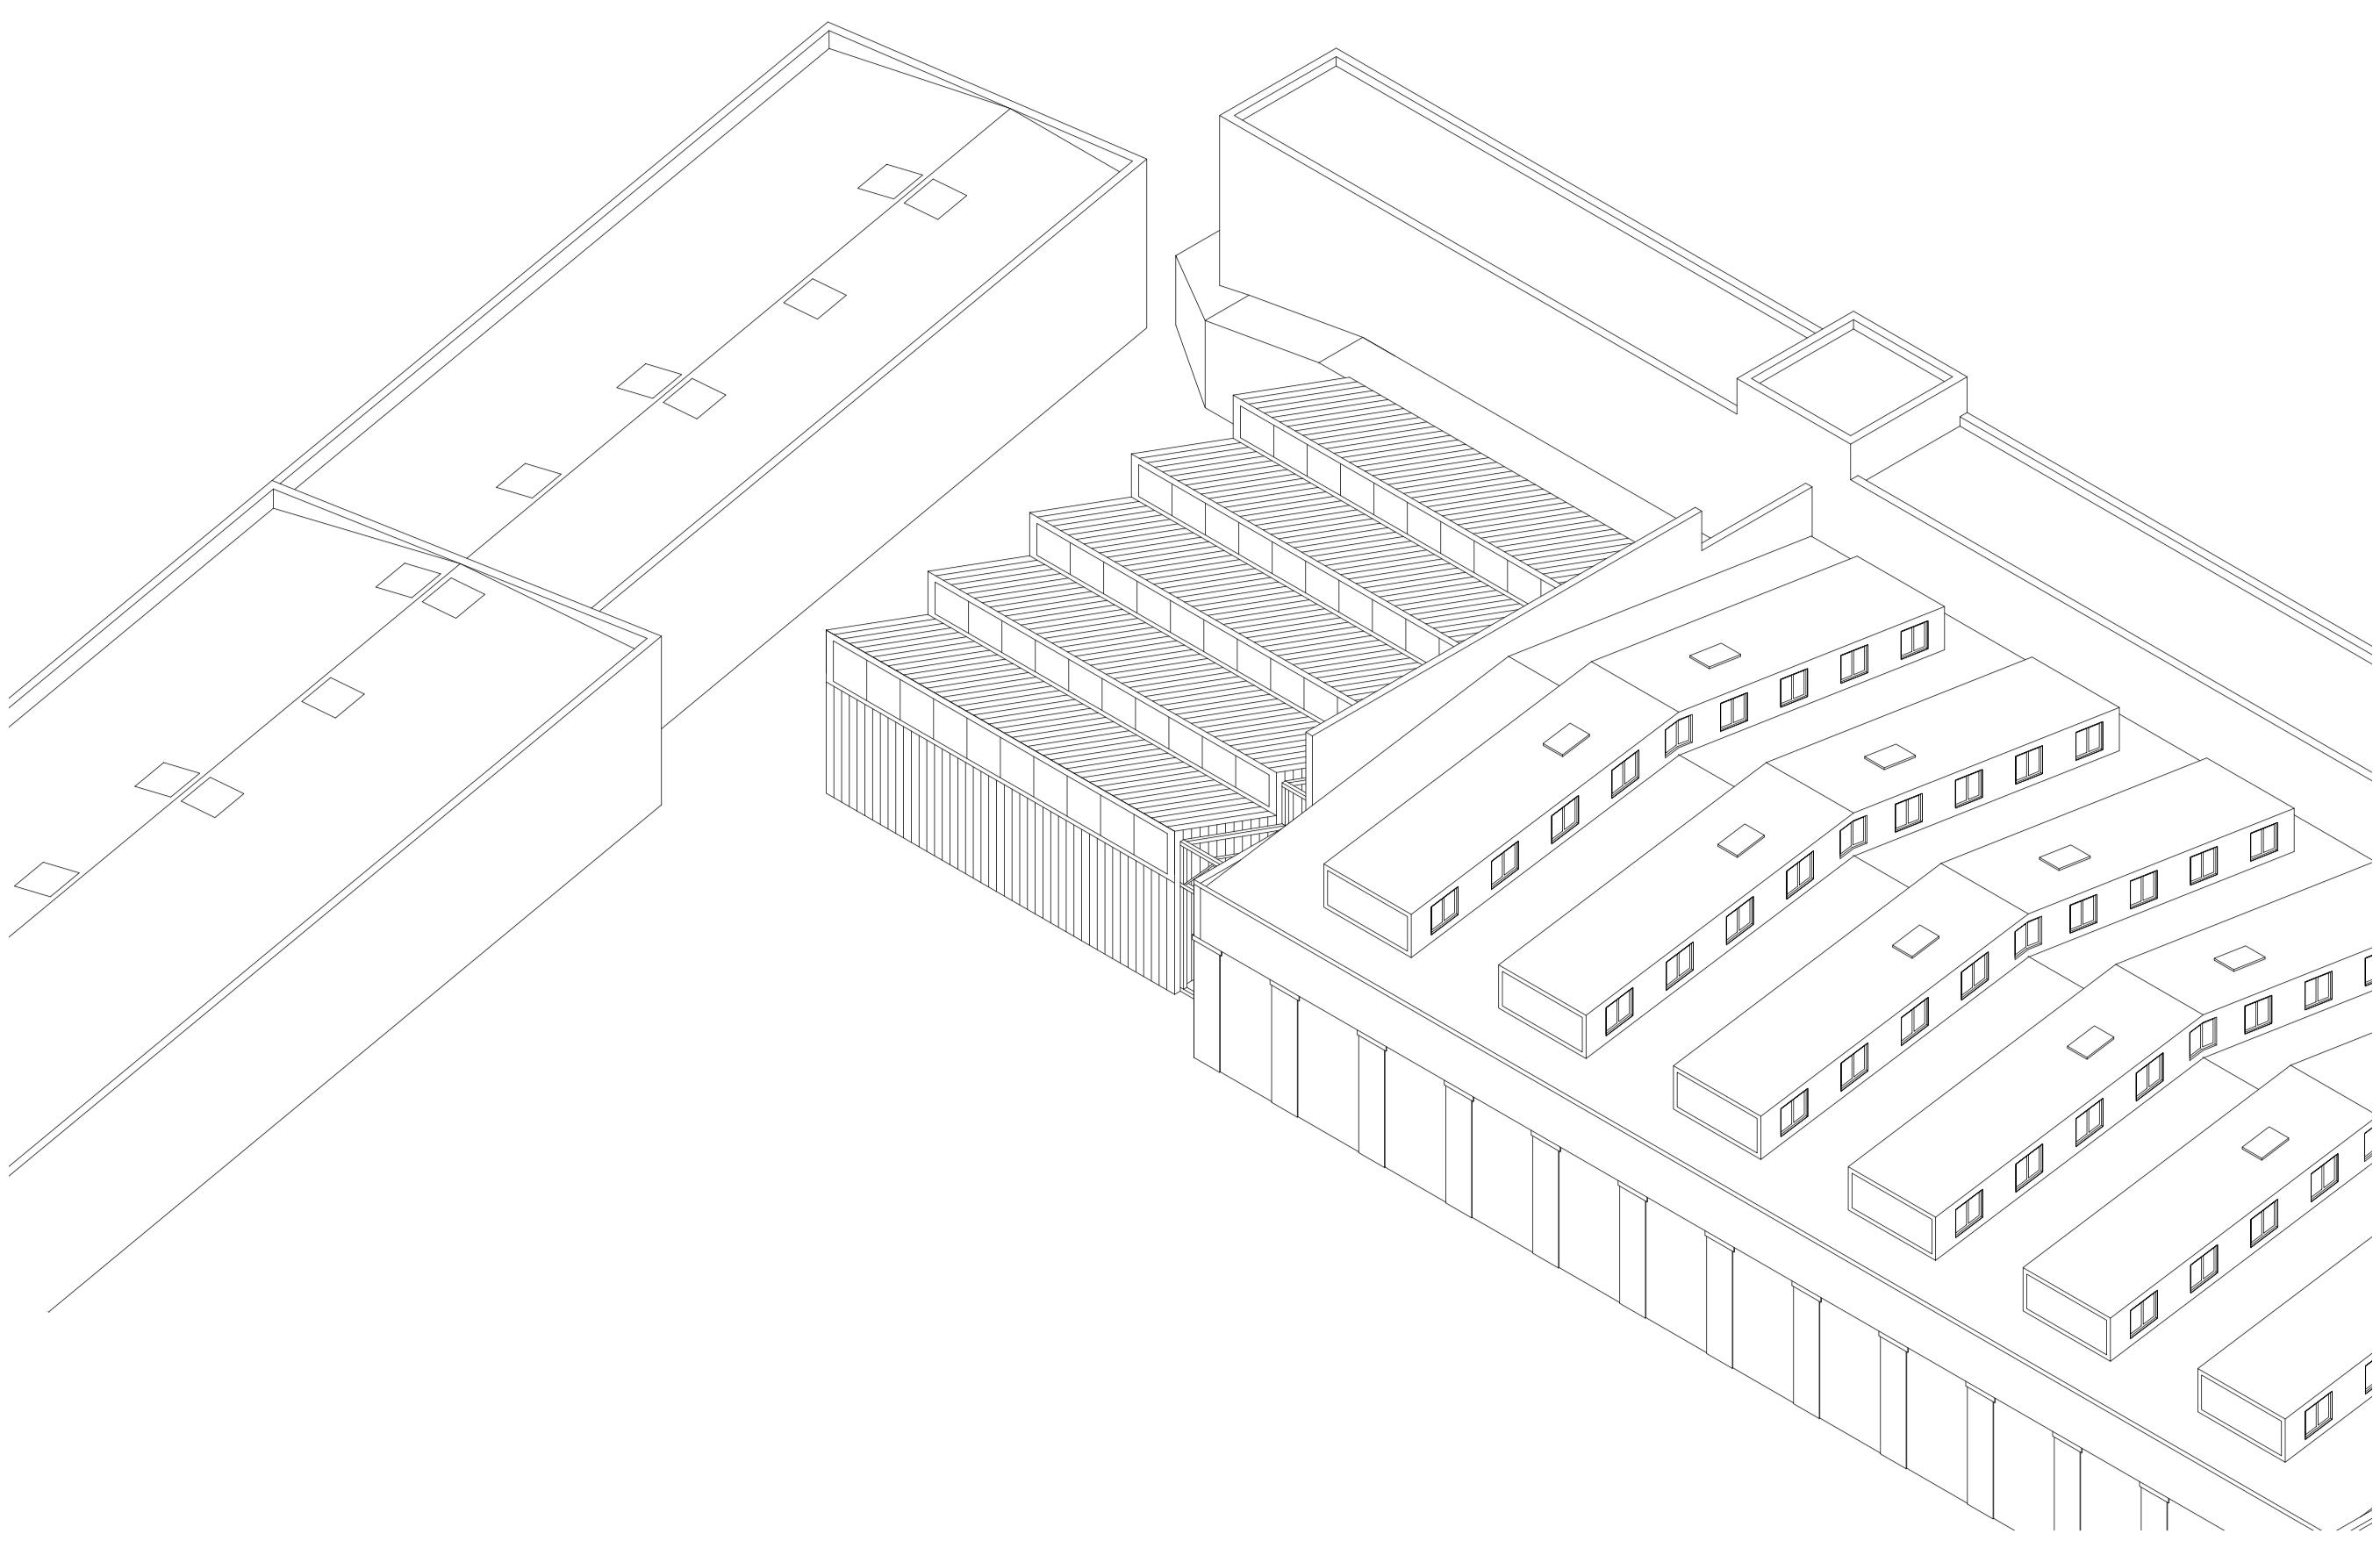 Rheinstahlhalle Axonometrie Rückbau Tanja Lincke Architekten